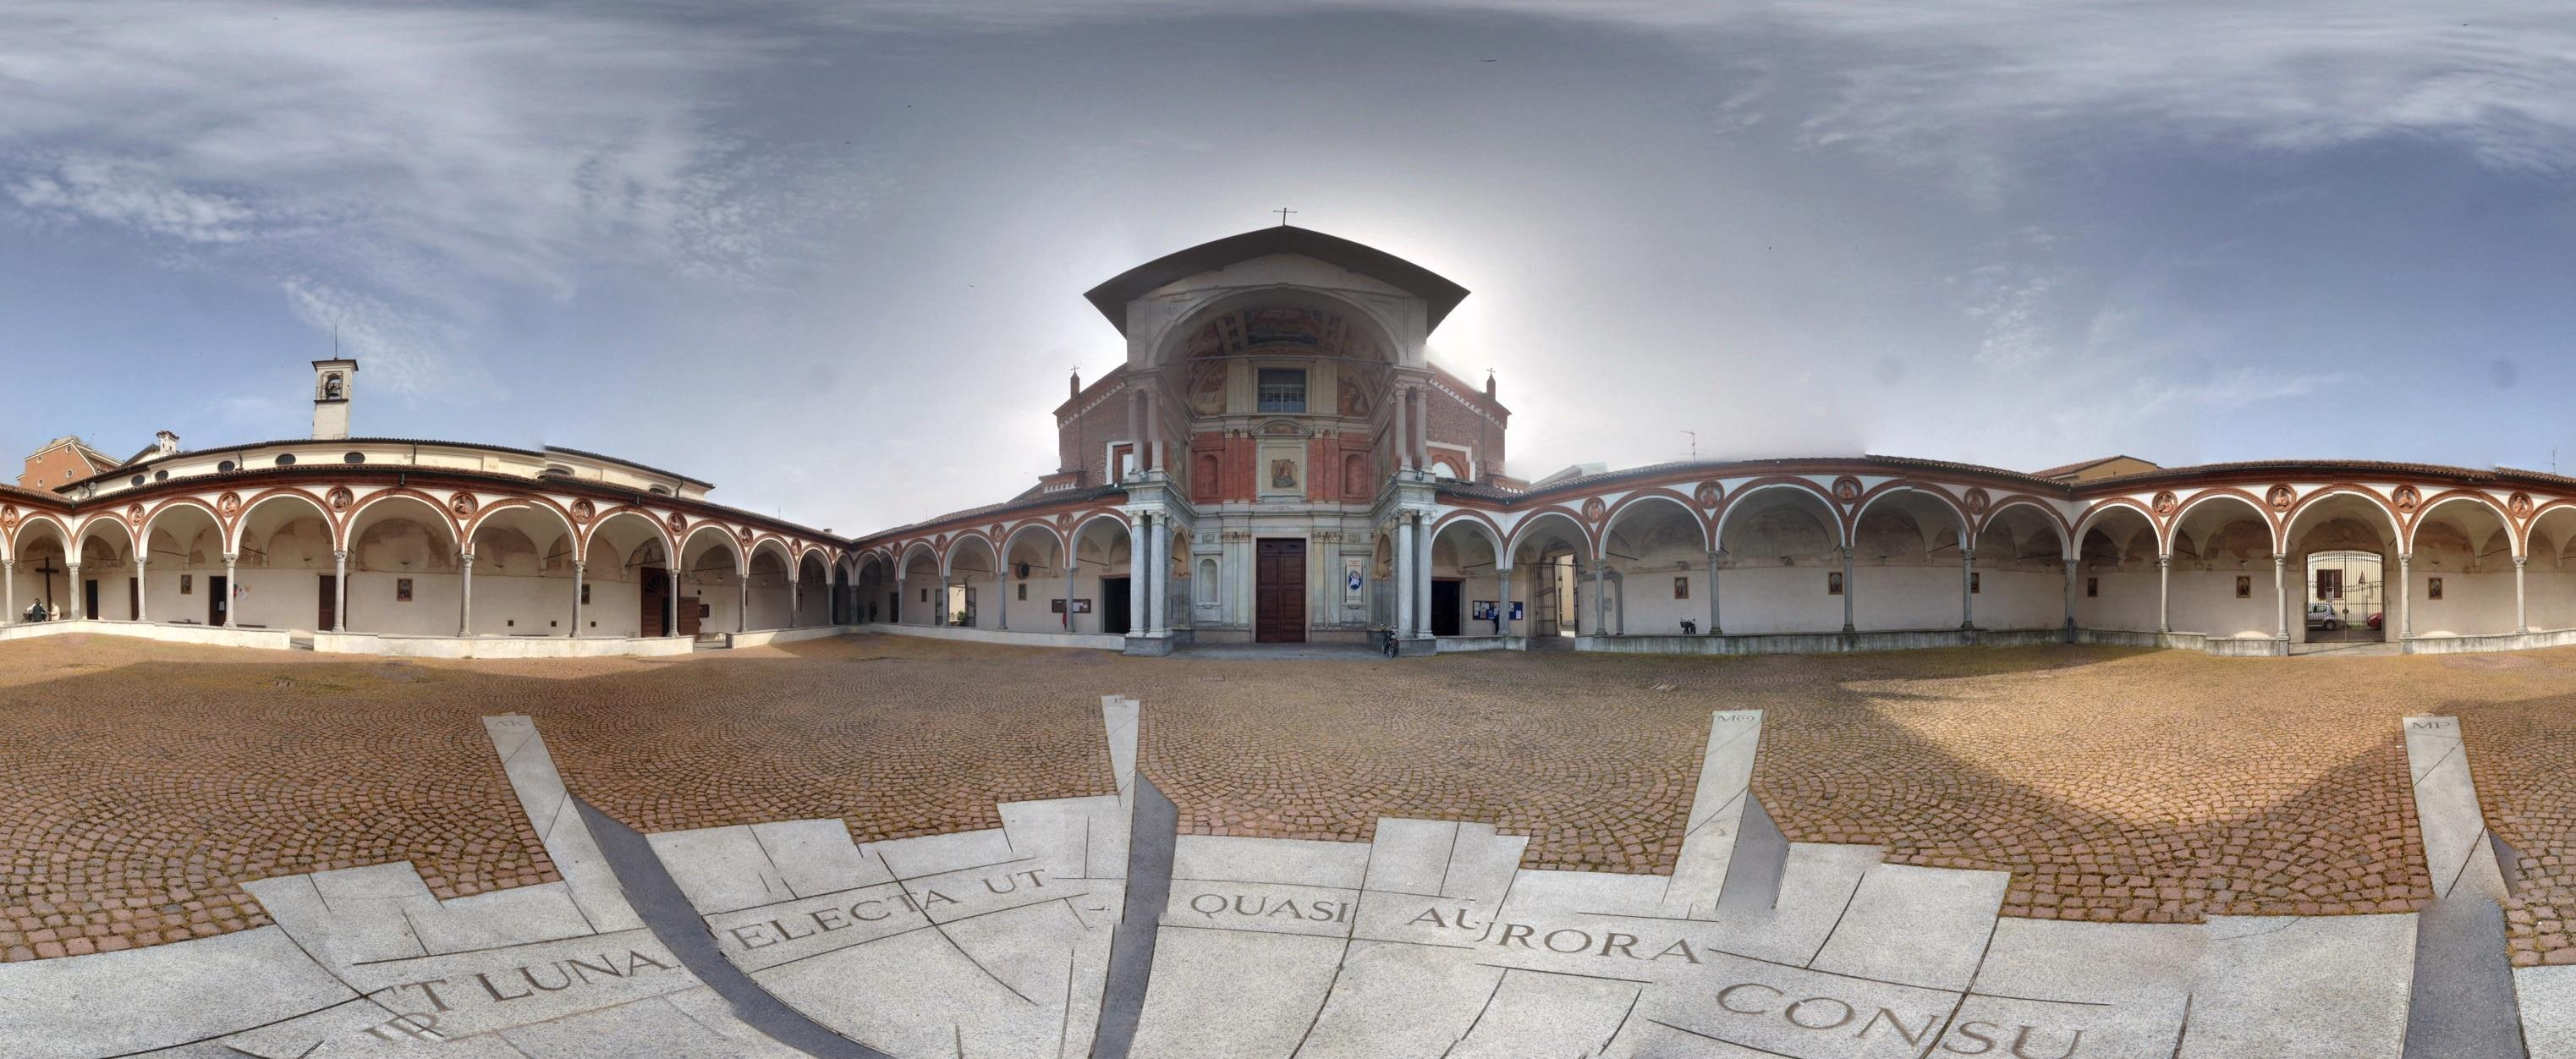 Abbiategrasso, Lombardy, Italy